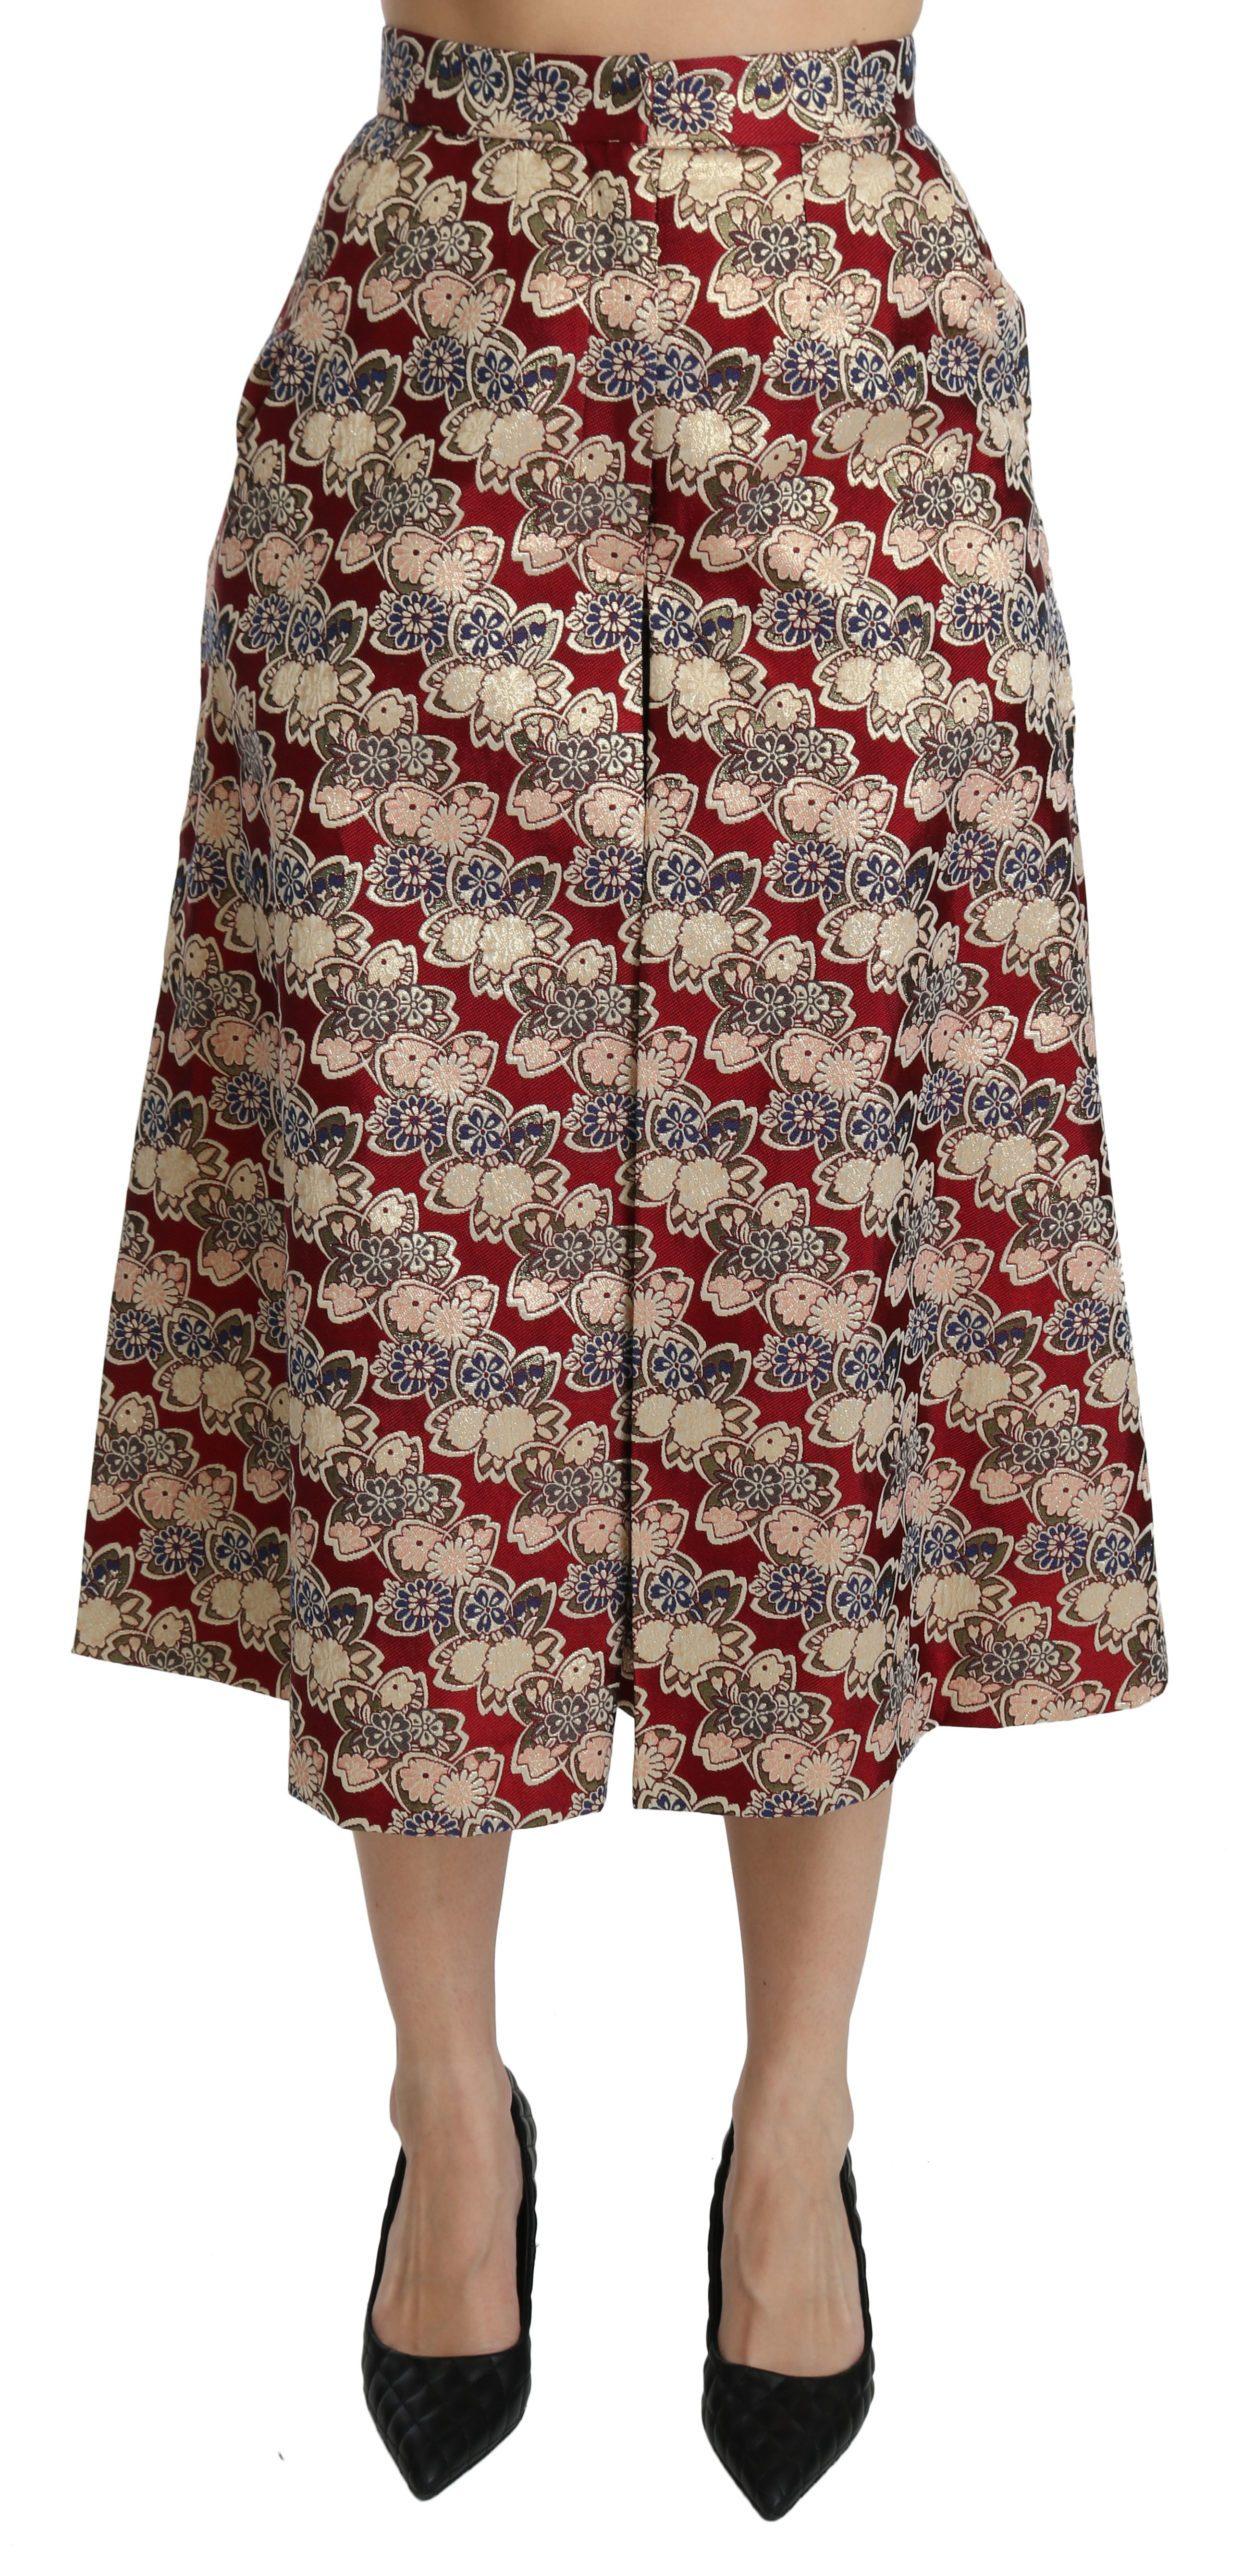 Dolce & Gabbana Women's Brocade High Waist Midi Skirt Beige SKI1341 - IT40|S